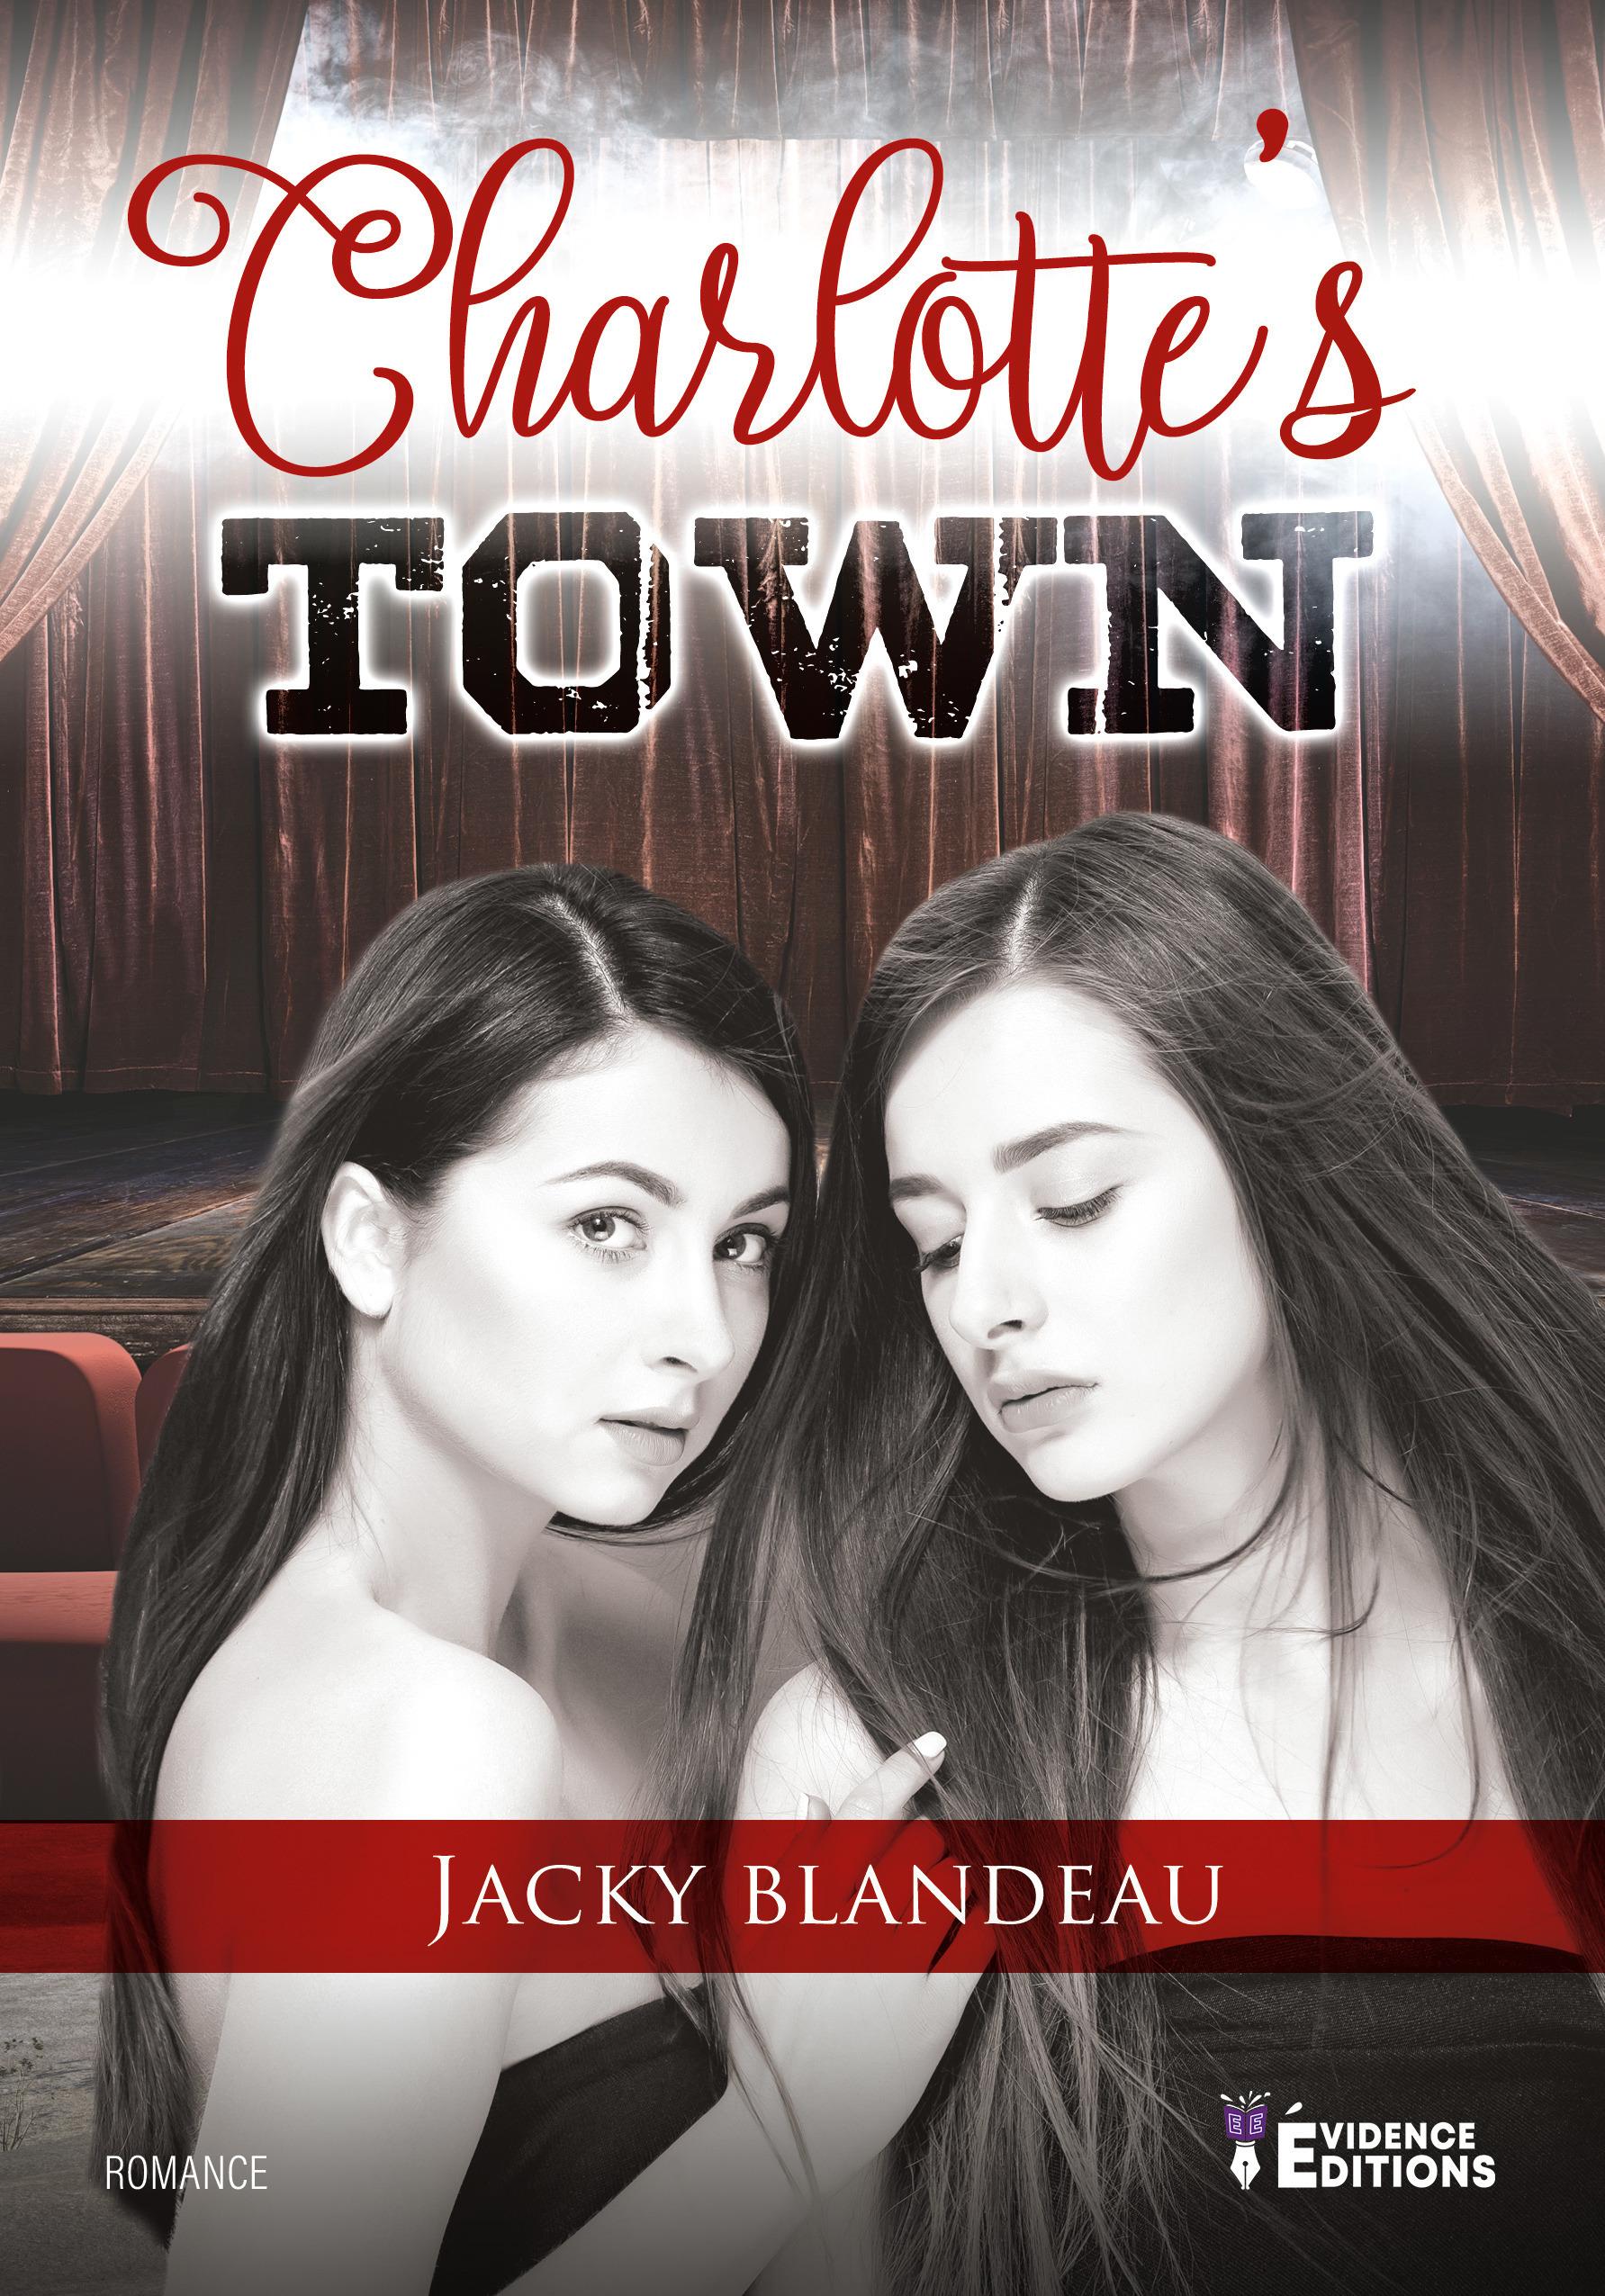 Charlott's Town